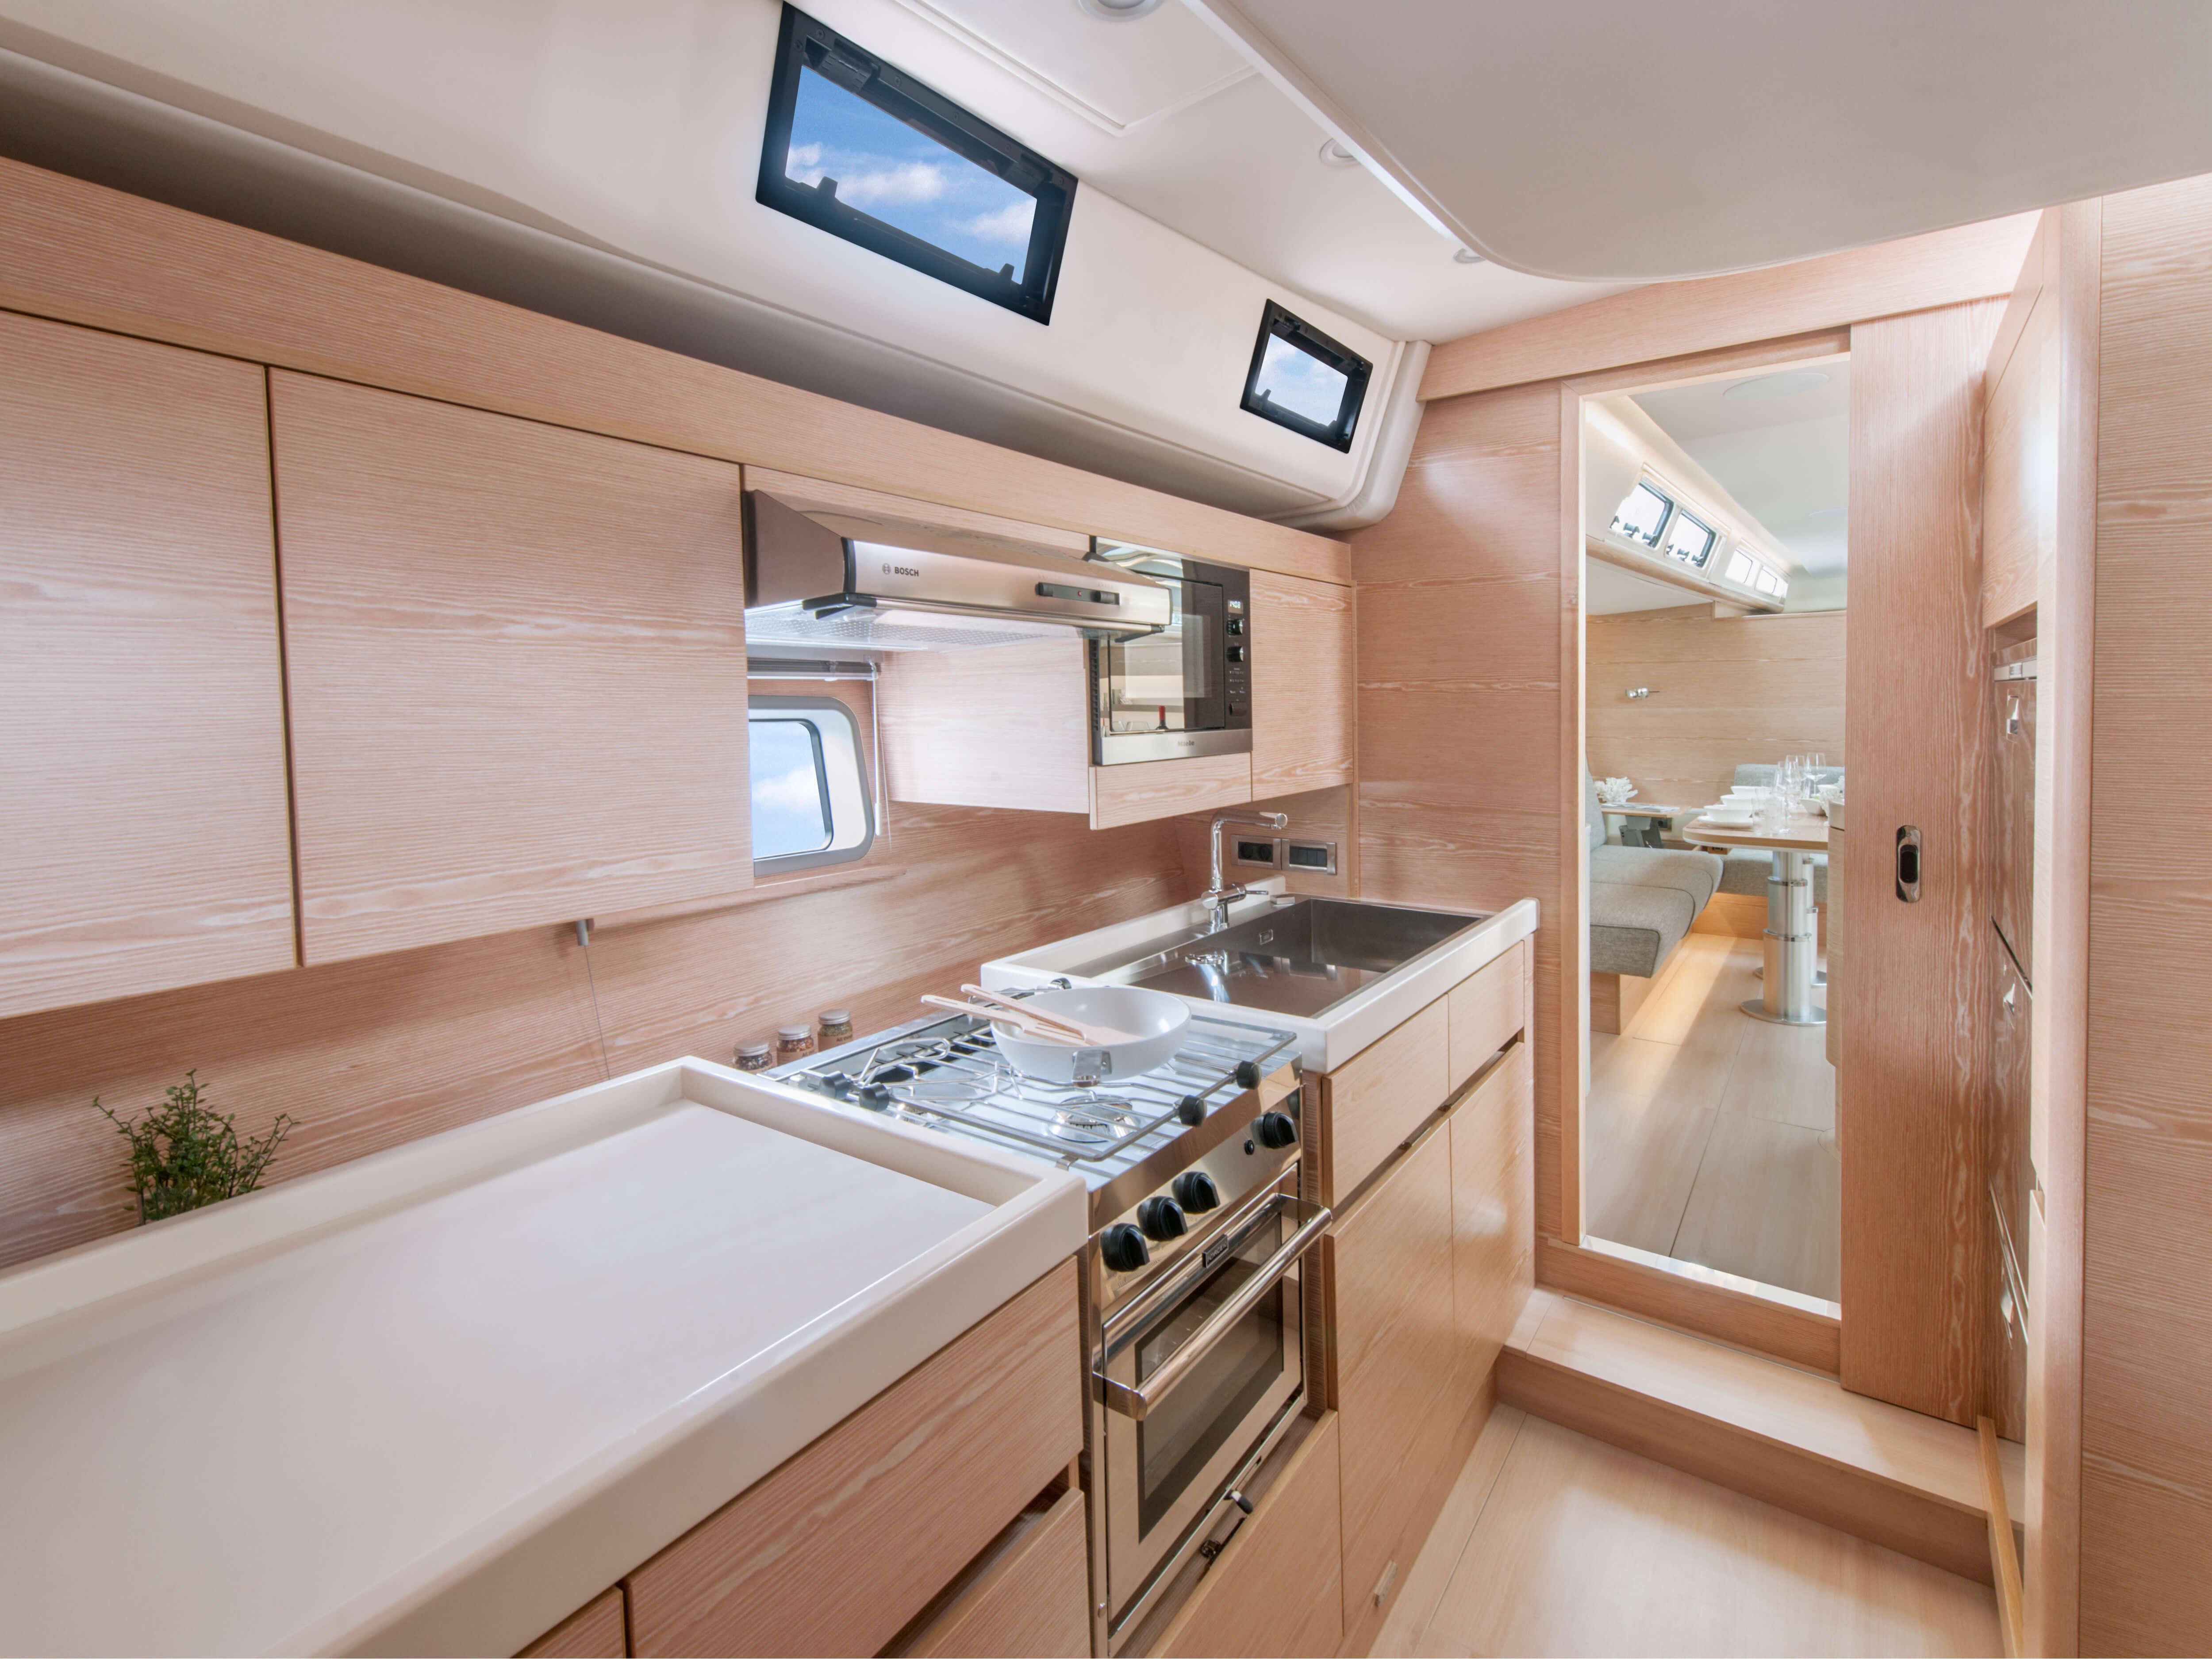 Hanse 675 | oven, microwave Miele, worktop | Hanse